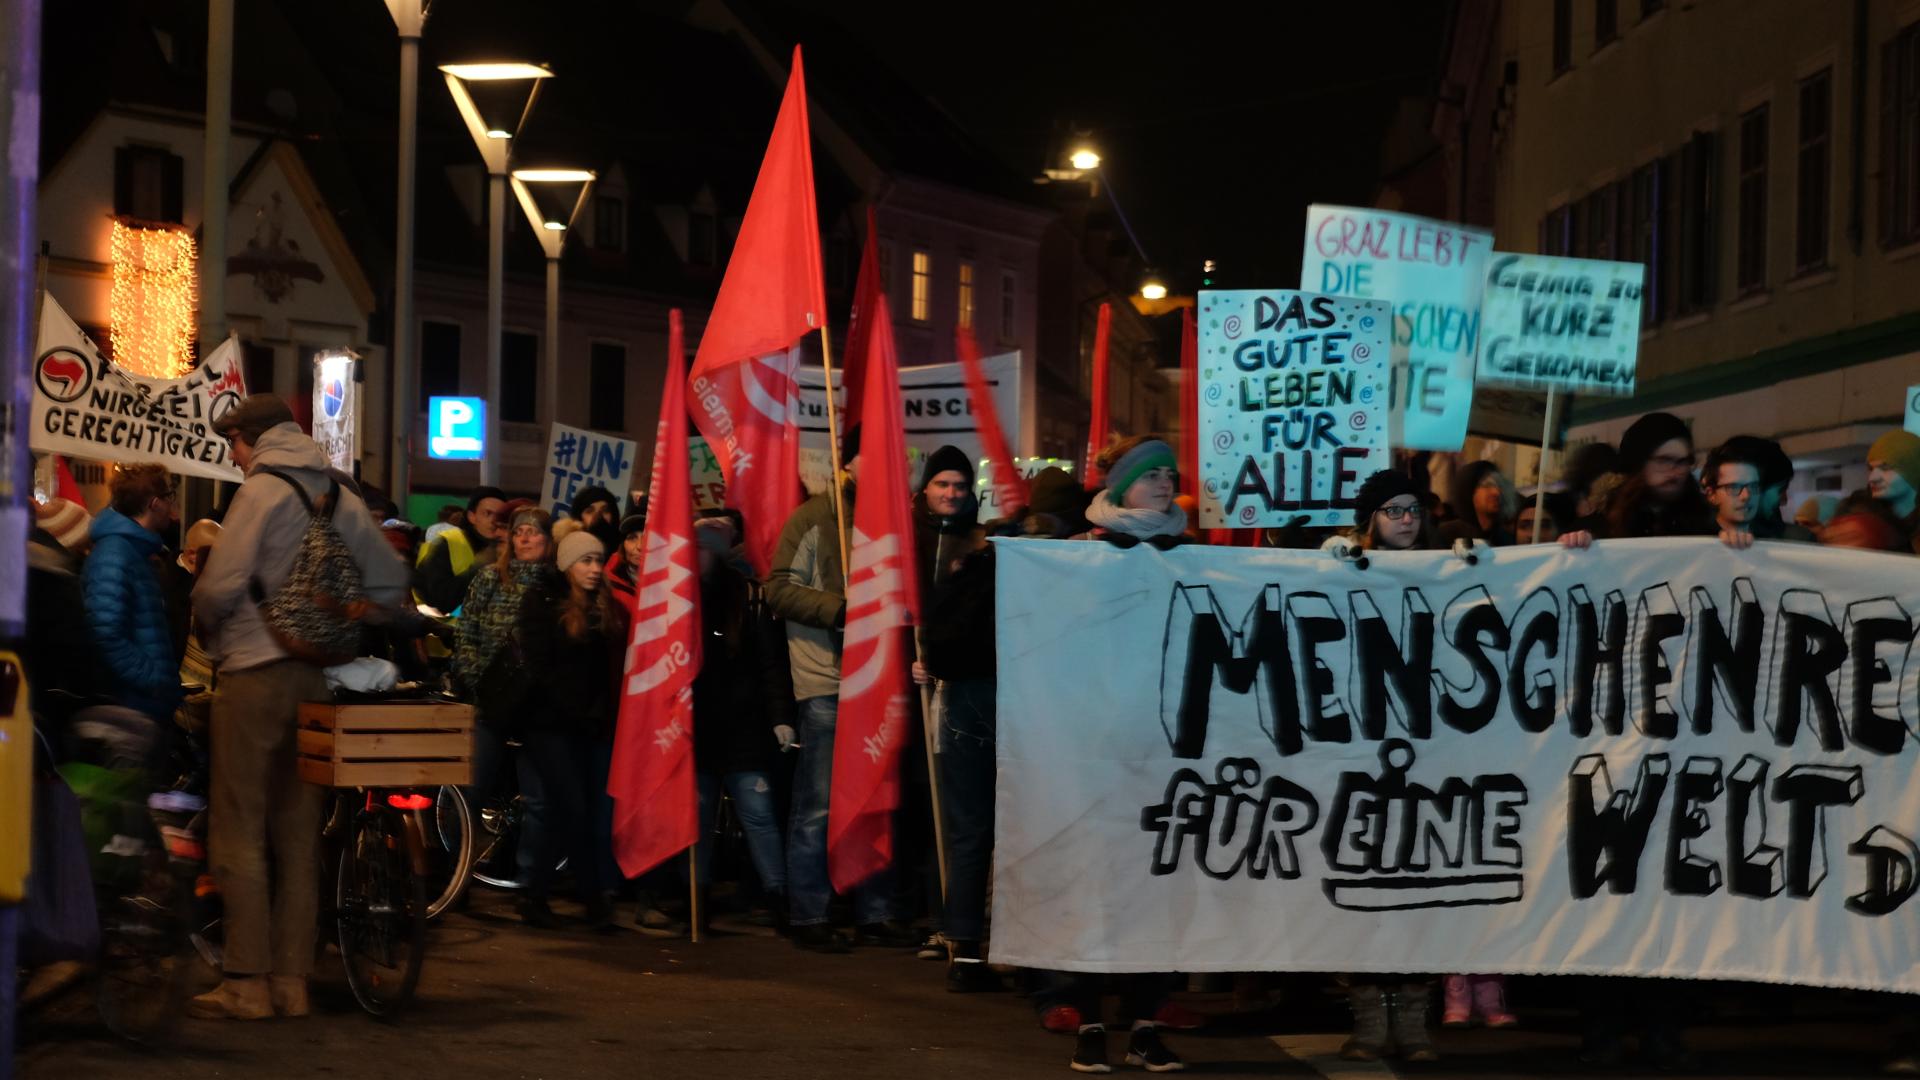 Donnerstagsdemo-Graz-Gewerkschaft-SPÖ-Plakate